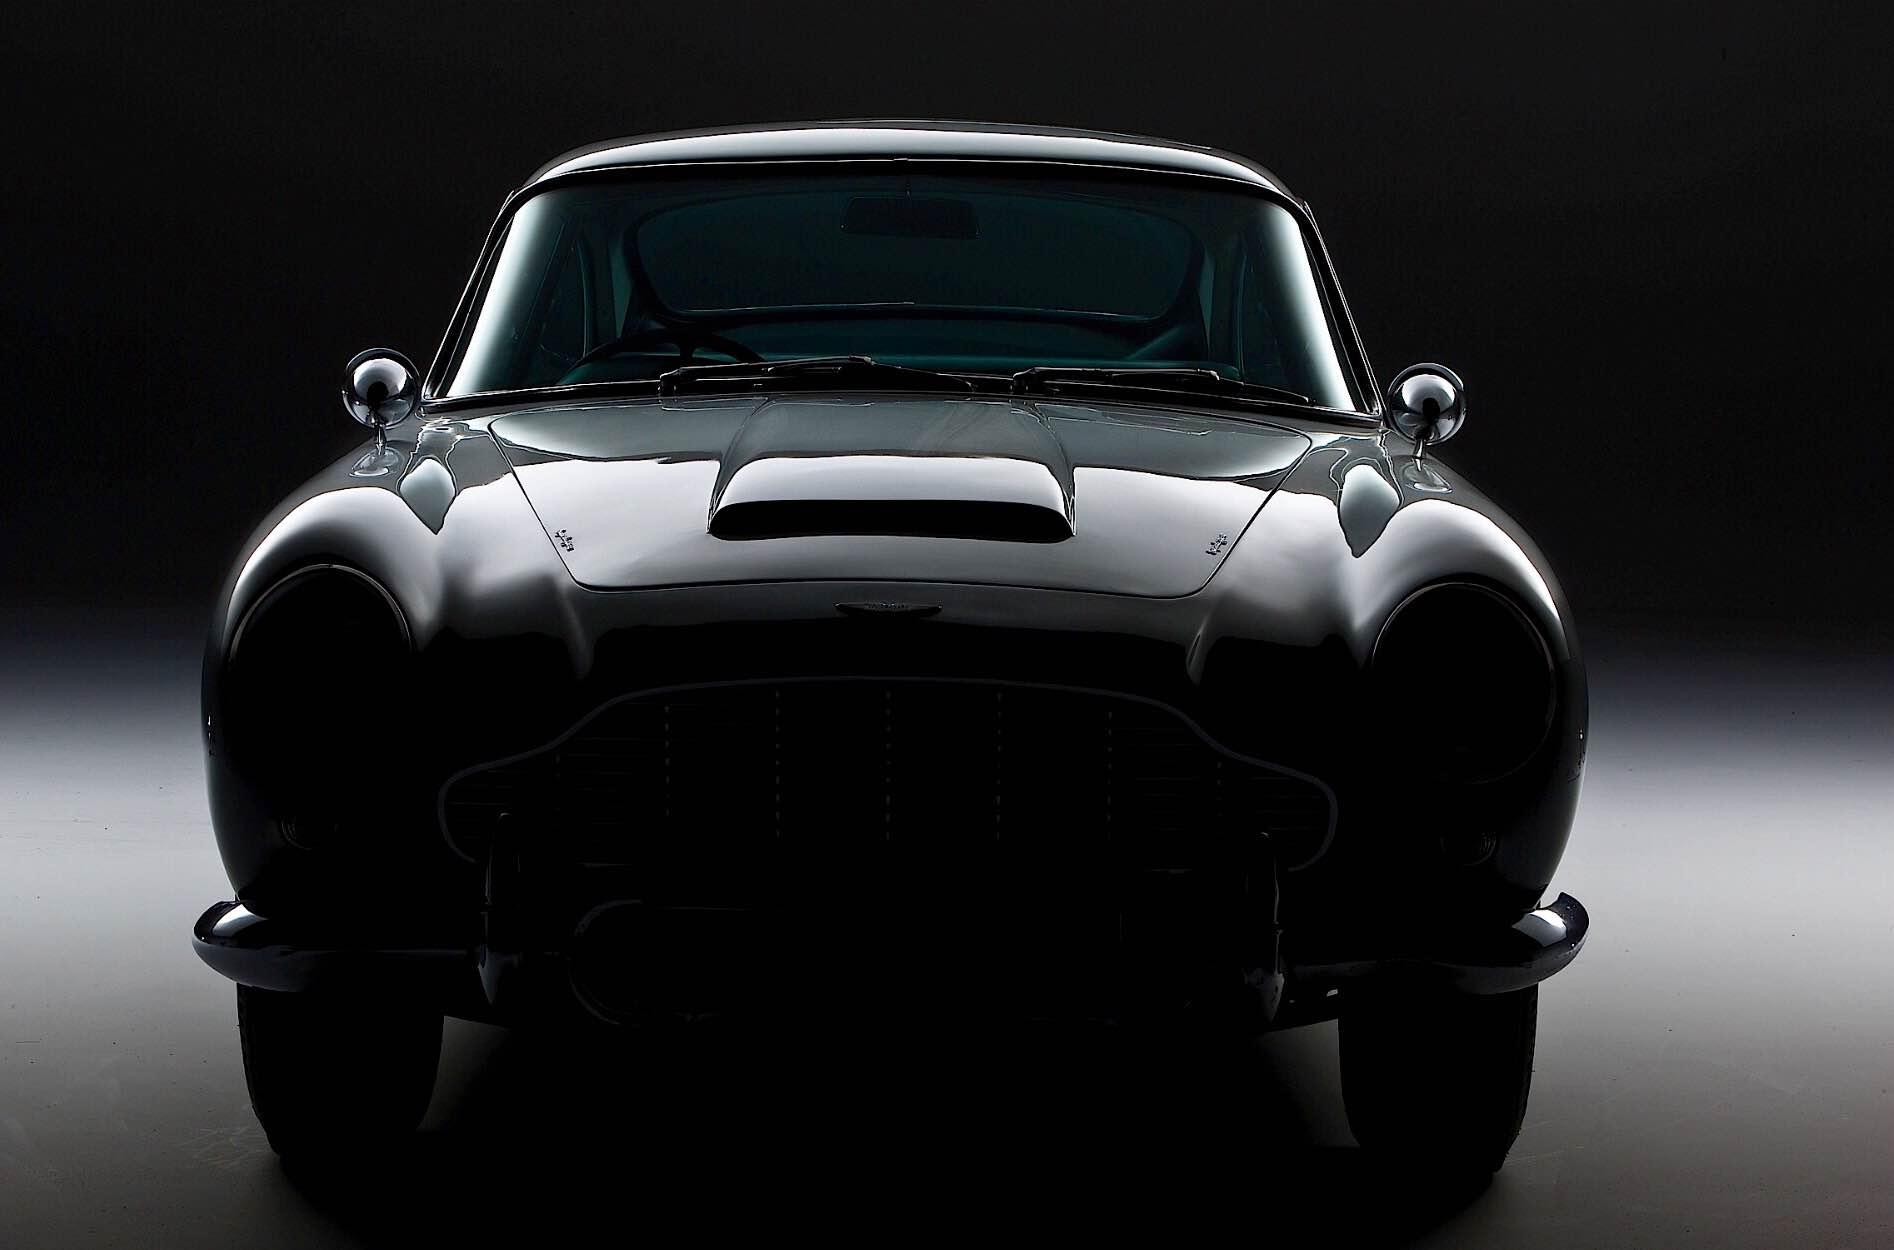 Image: Aston Martin DB5